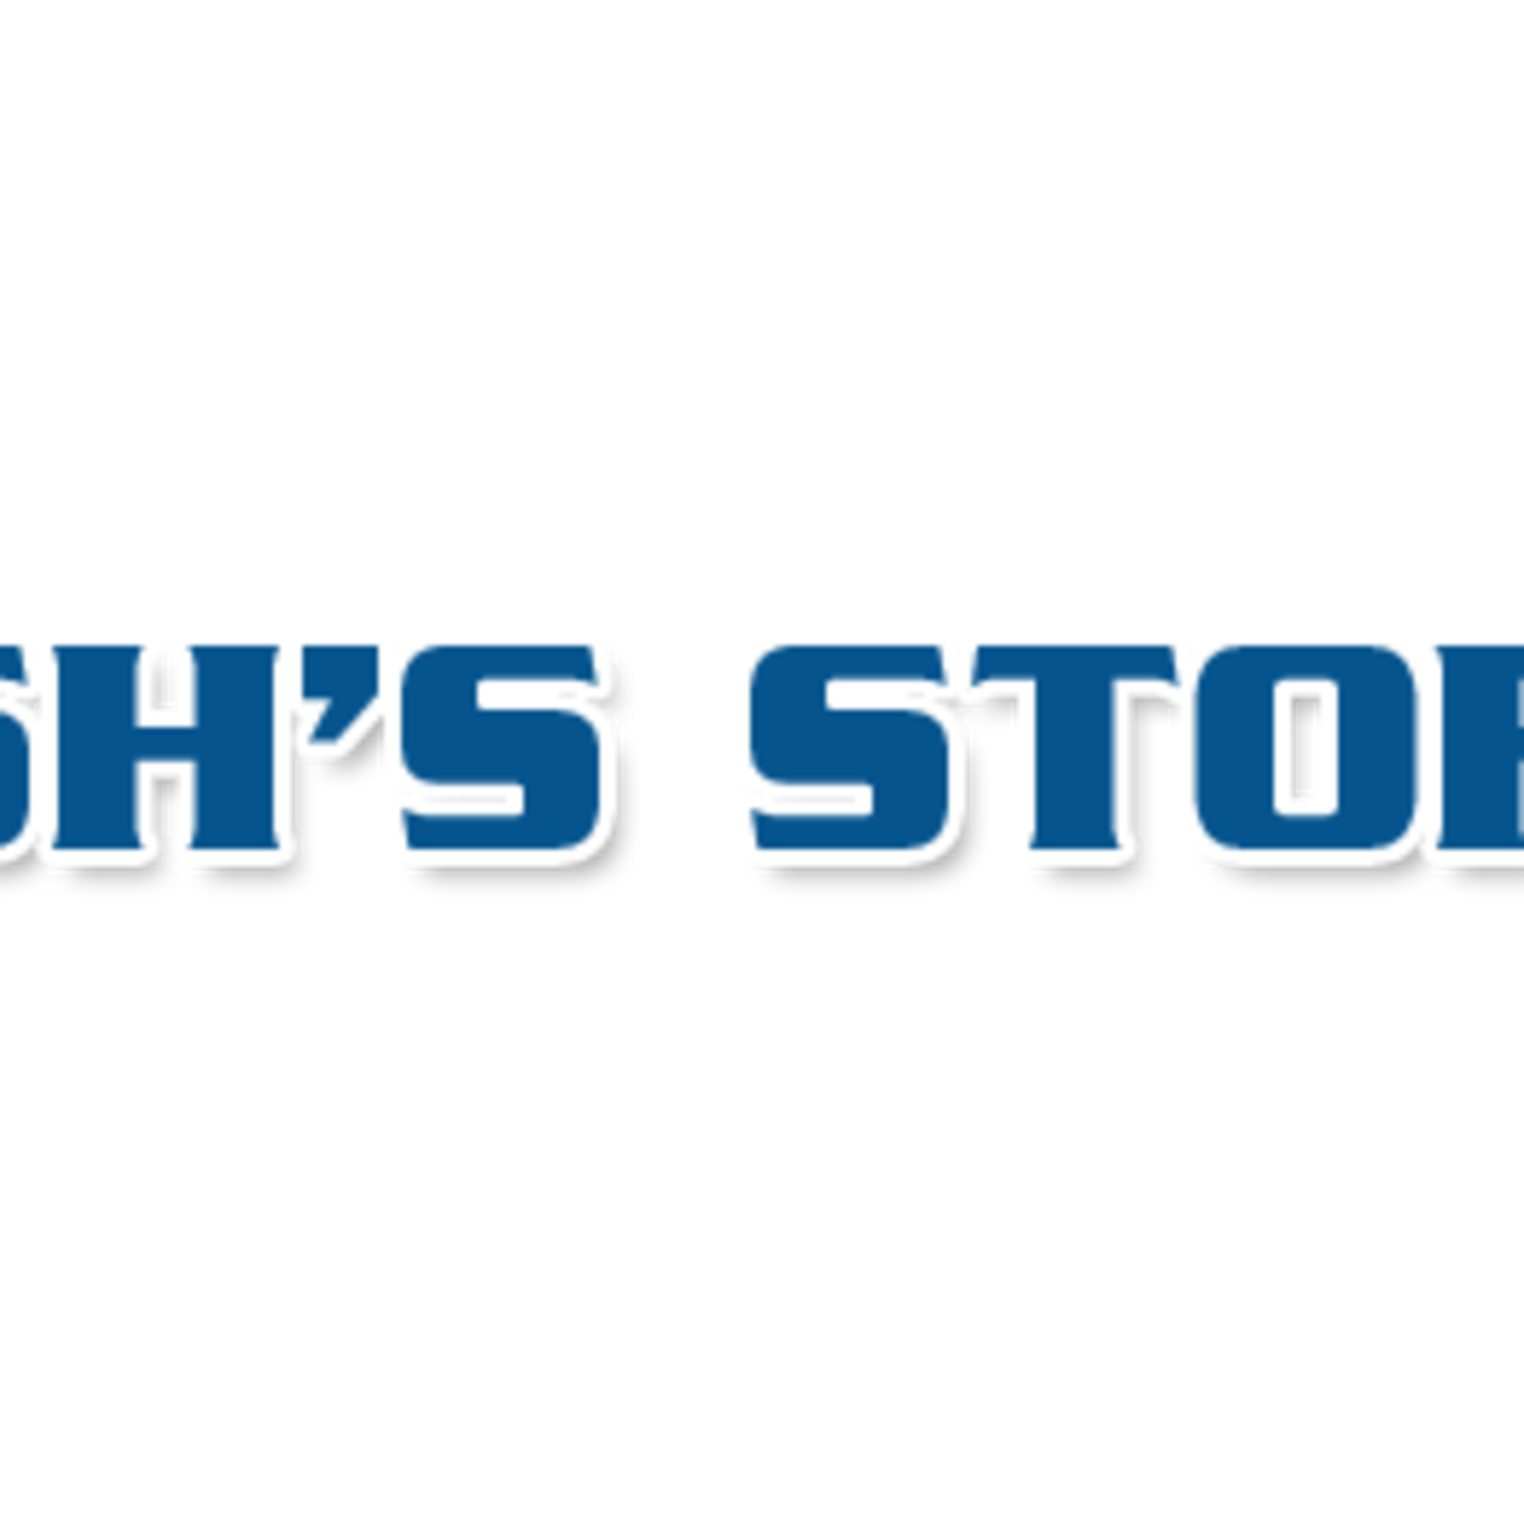 Esh's Store